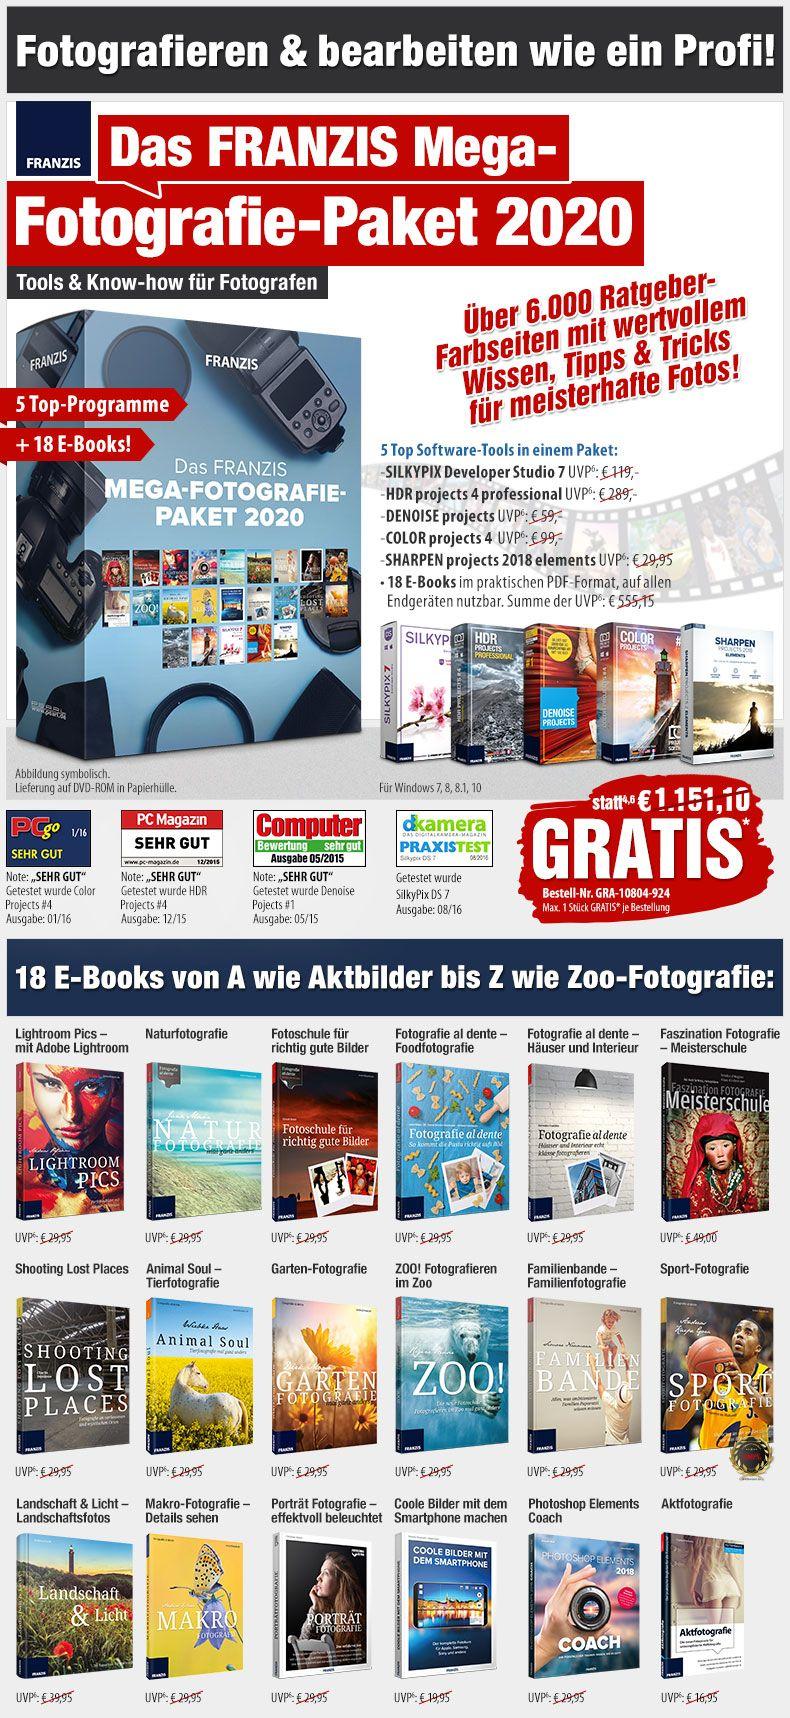 FRANZIS Mega-Fotografie-Paket 2020 auf DVD-ROM